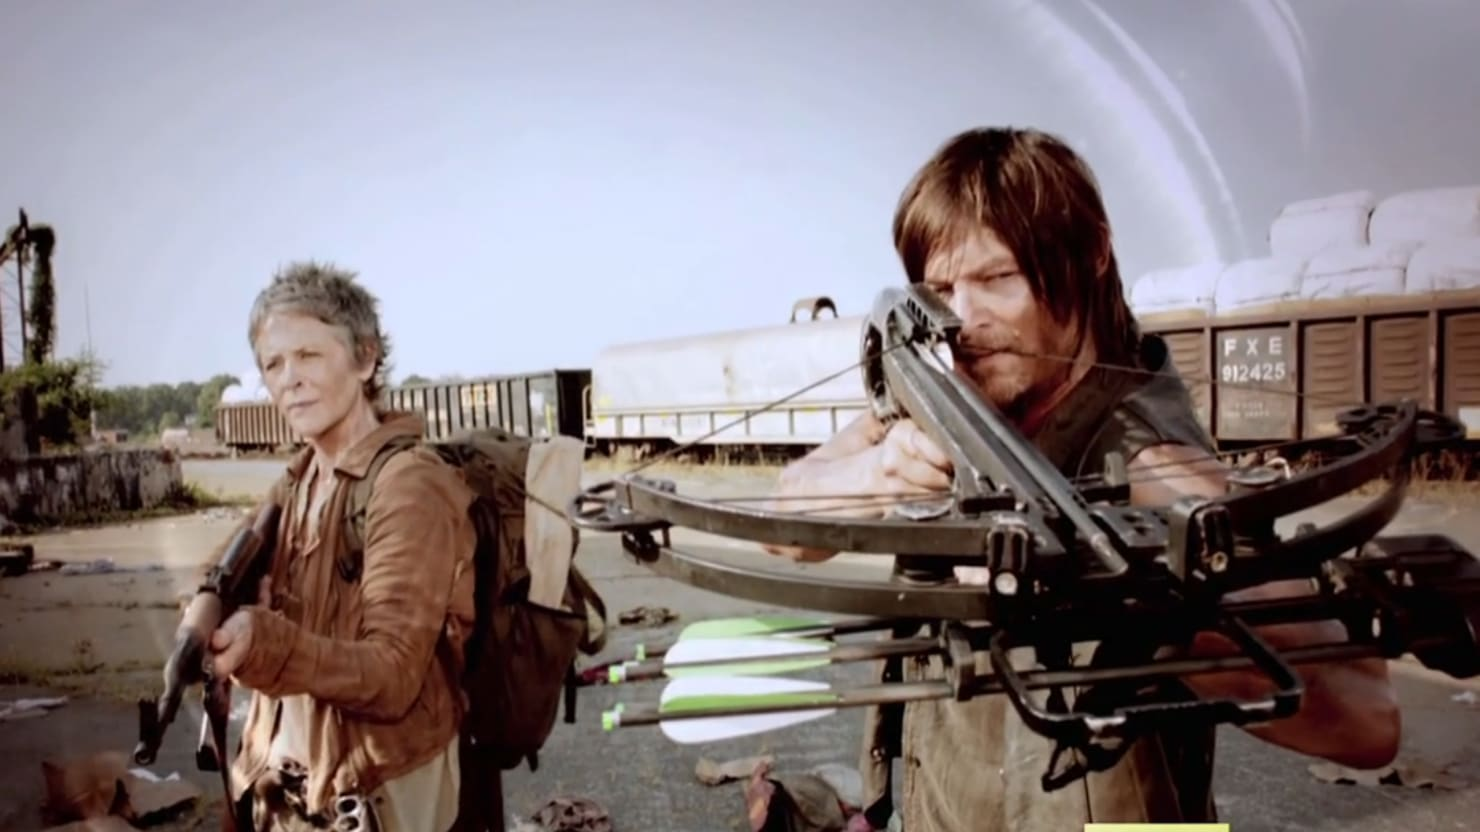 Daryl and Carol Reunite in New Walking Dead Teaser Trailer